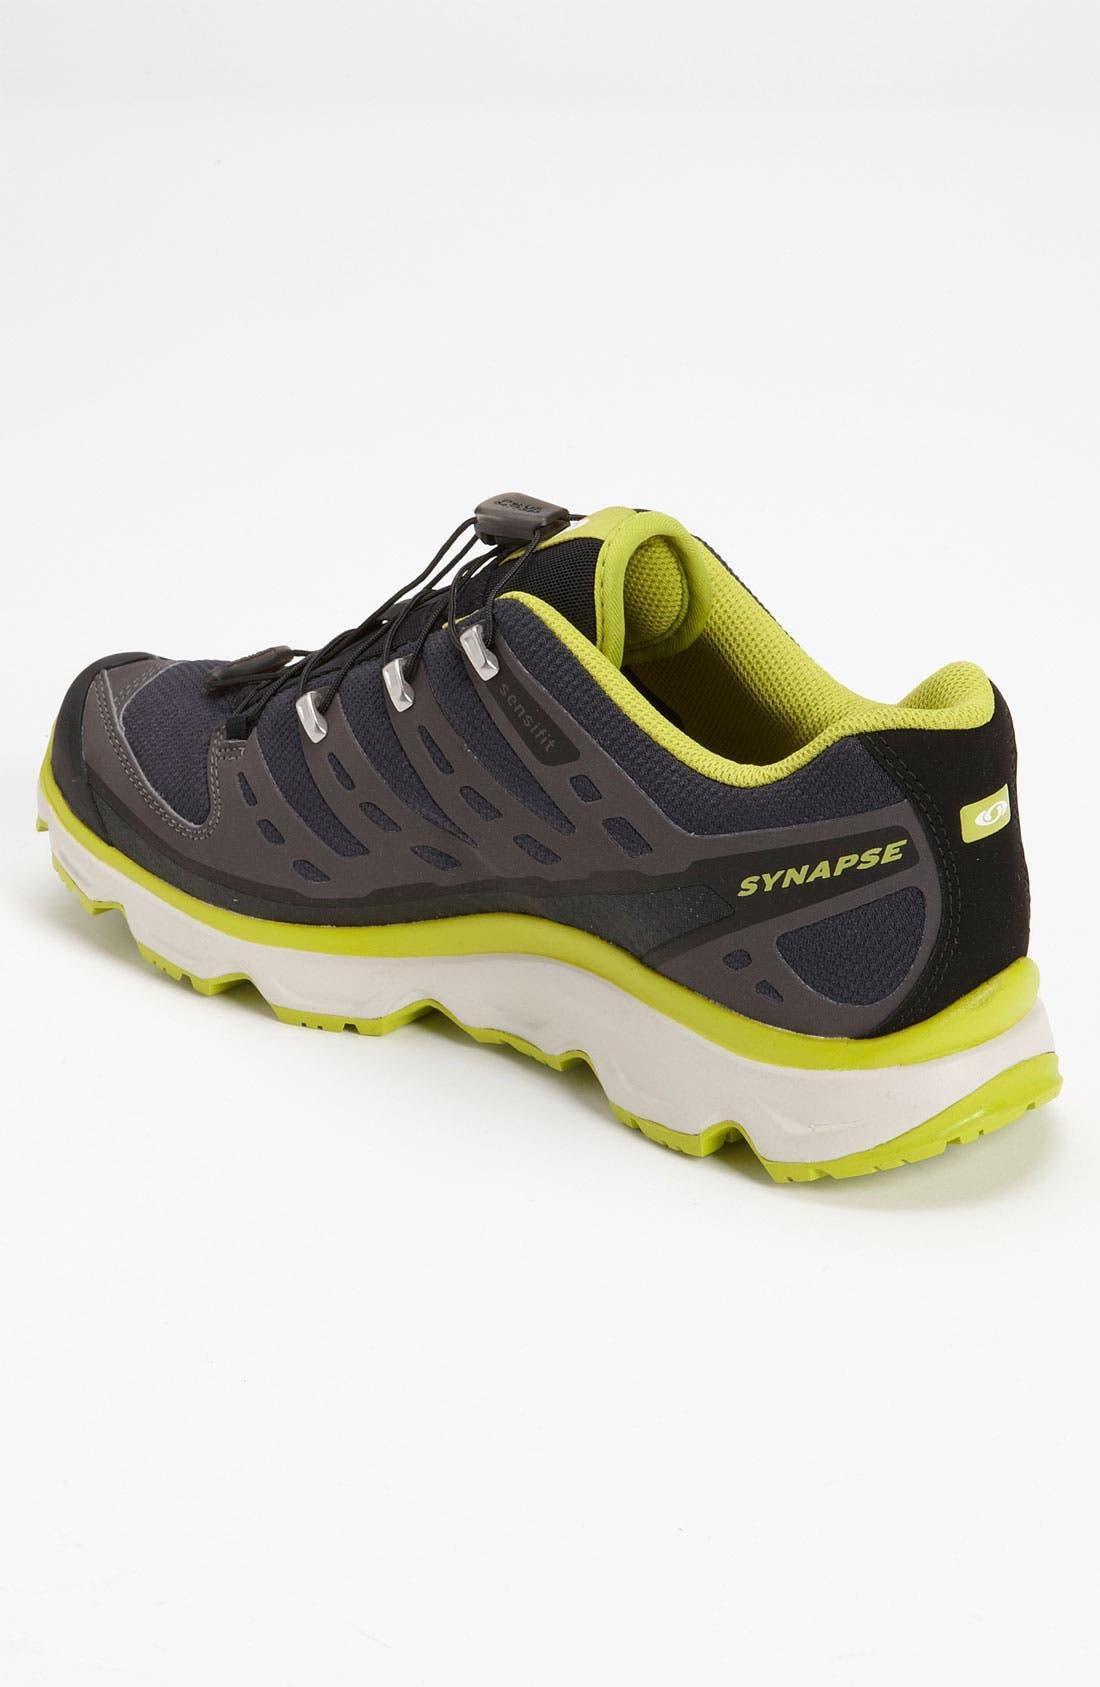 Alternate Image 2  - Salomon 'Synapse' Hiking Shoe (Men)